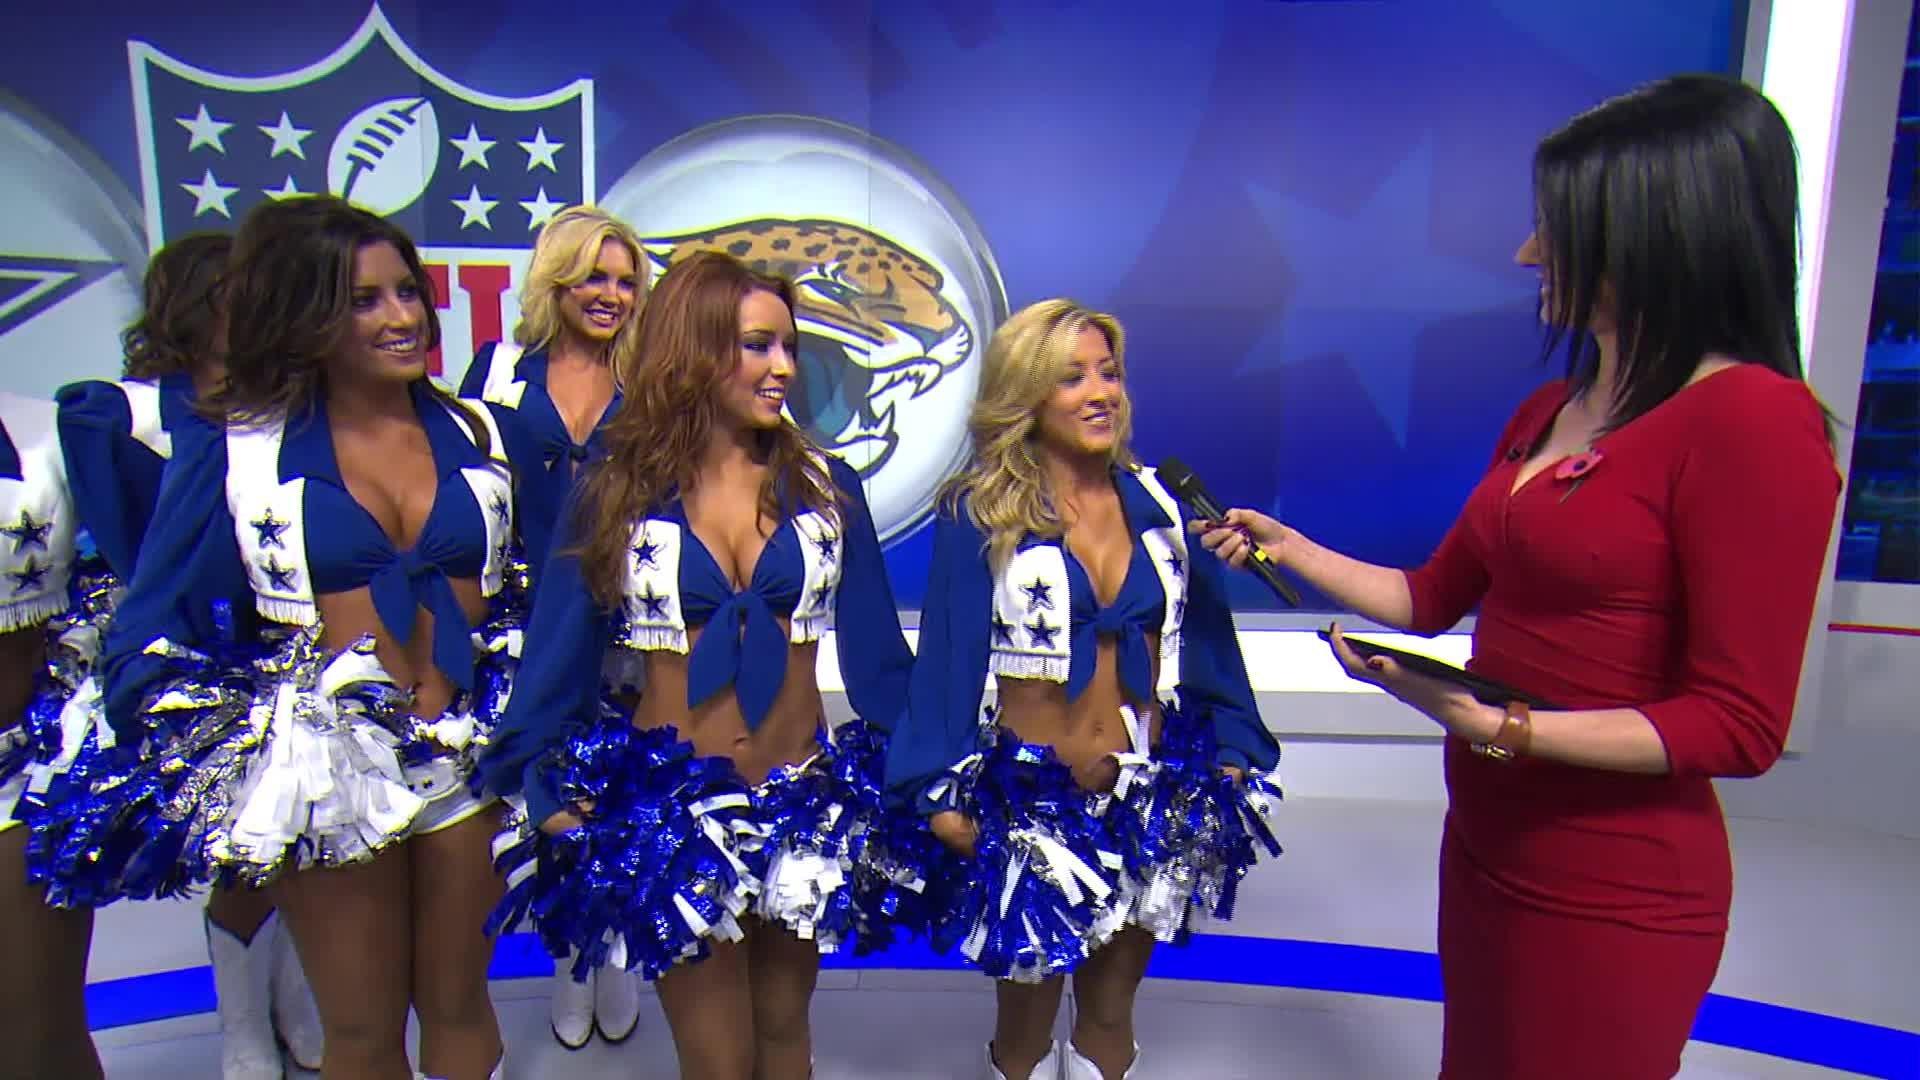 Cowboys cheerleaders on SSN HQ